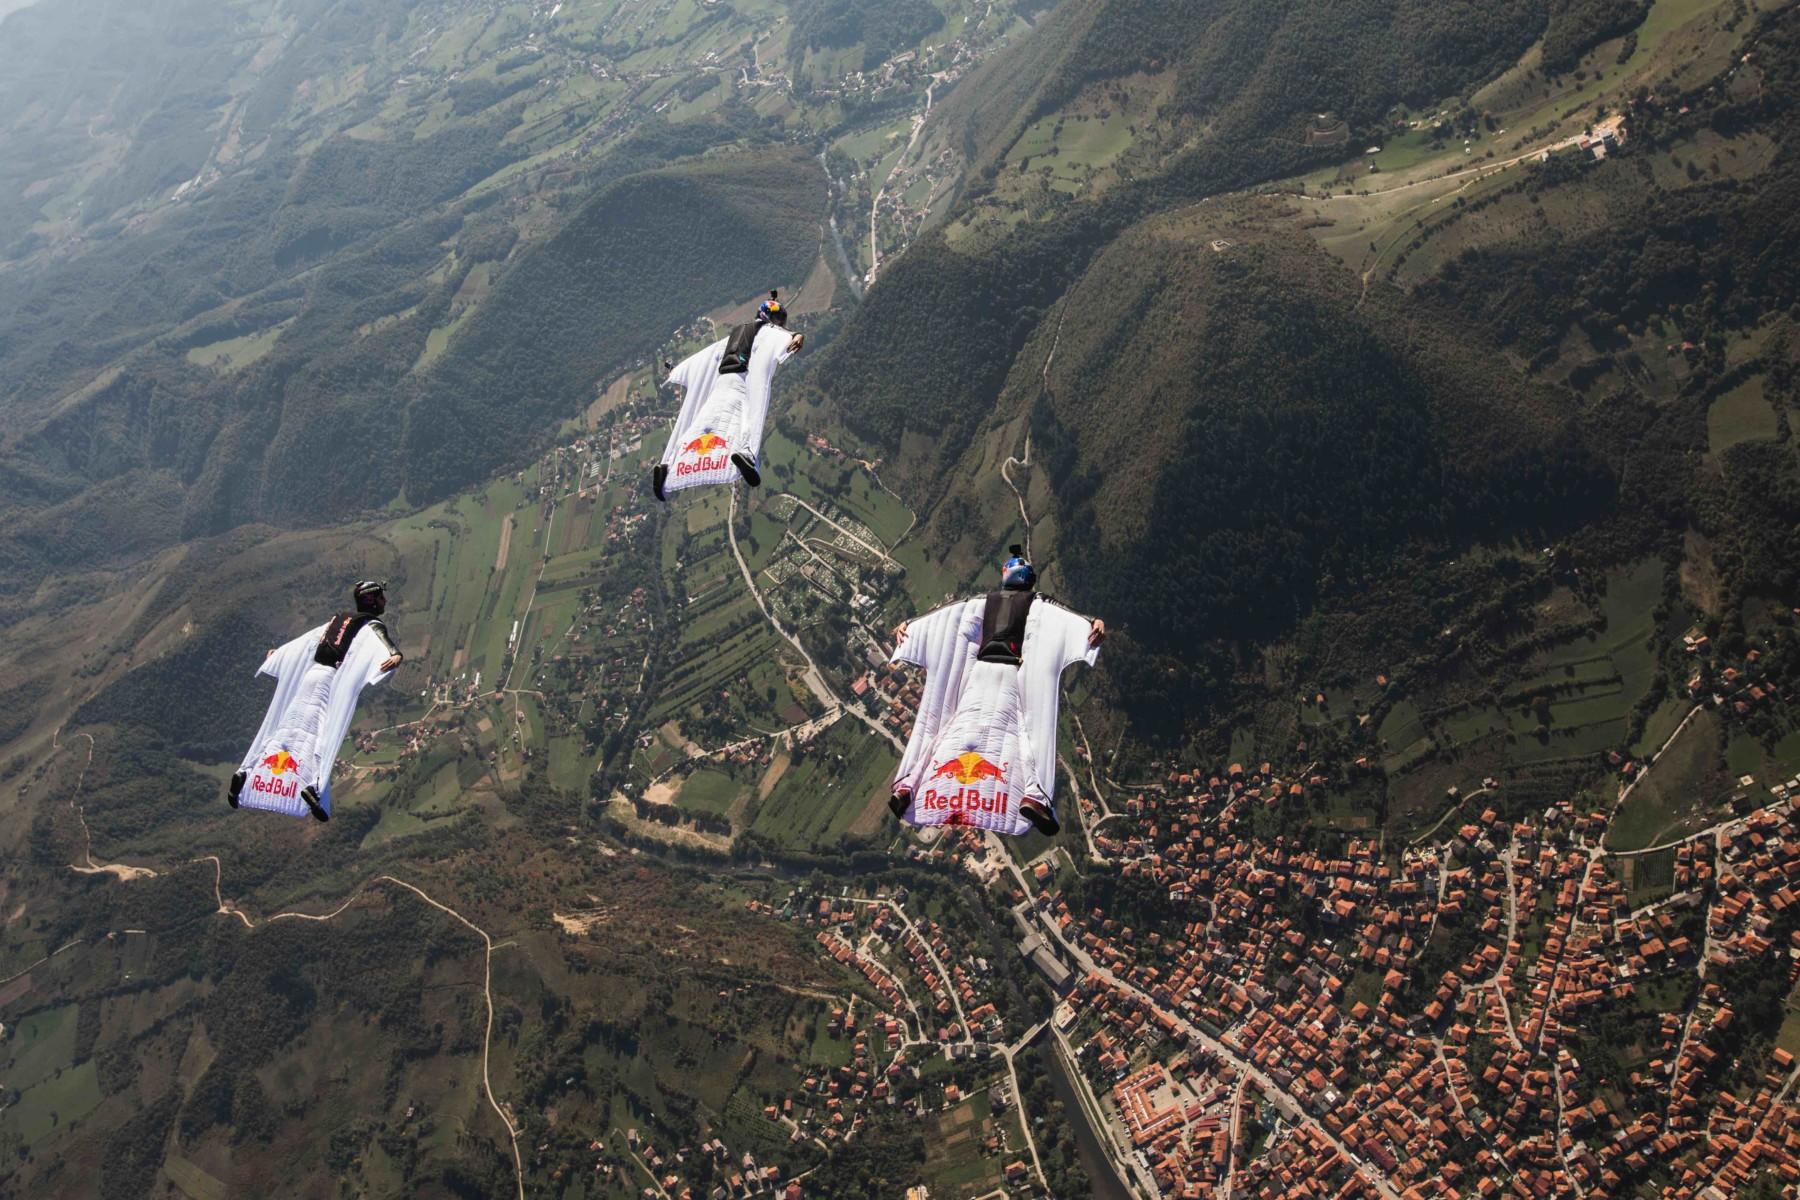 Red Bull Skydive >> Bosnian Pyramids